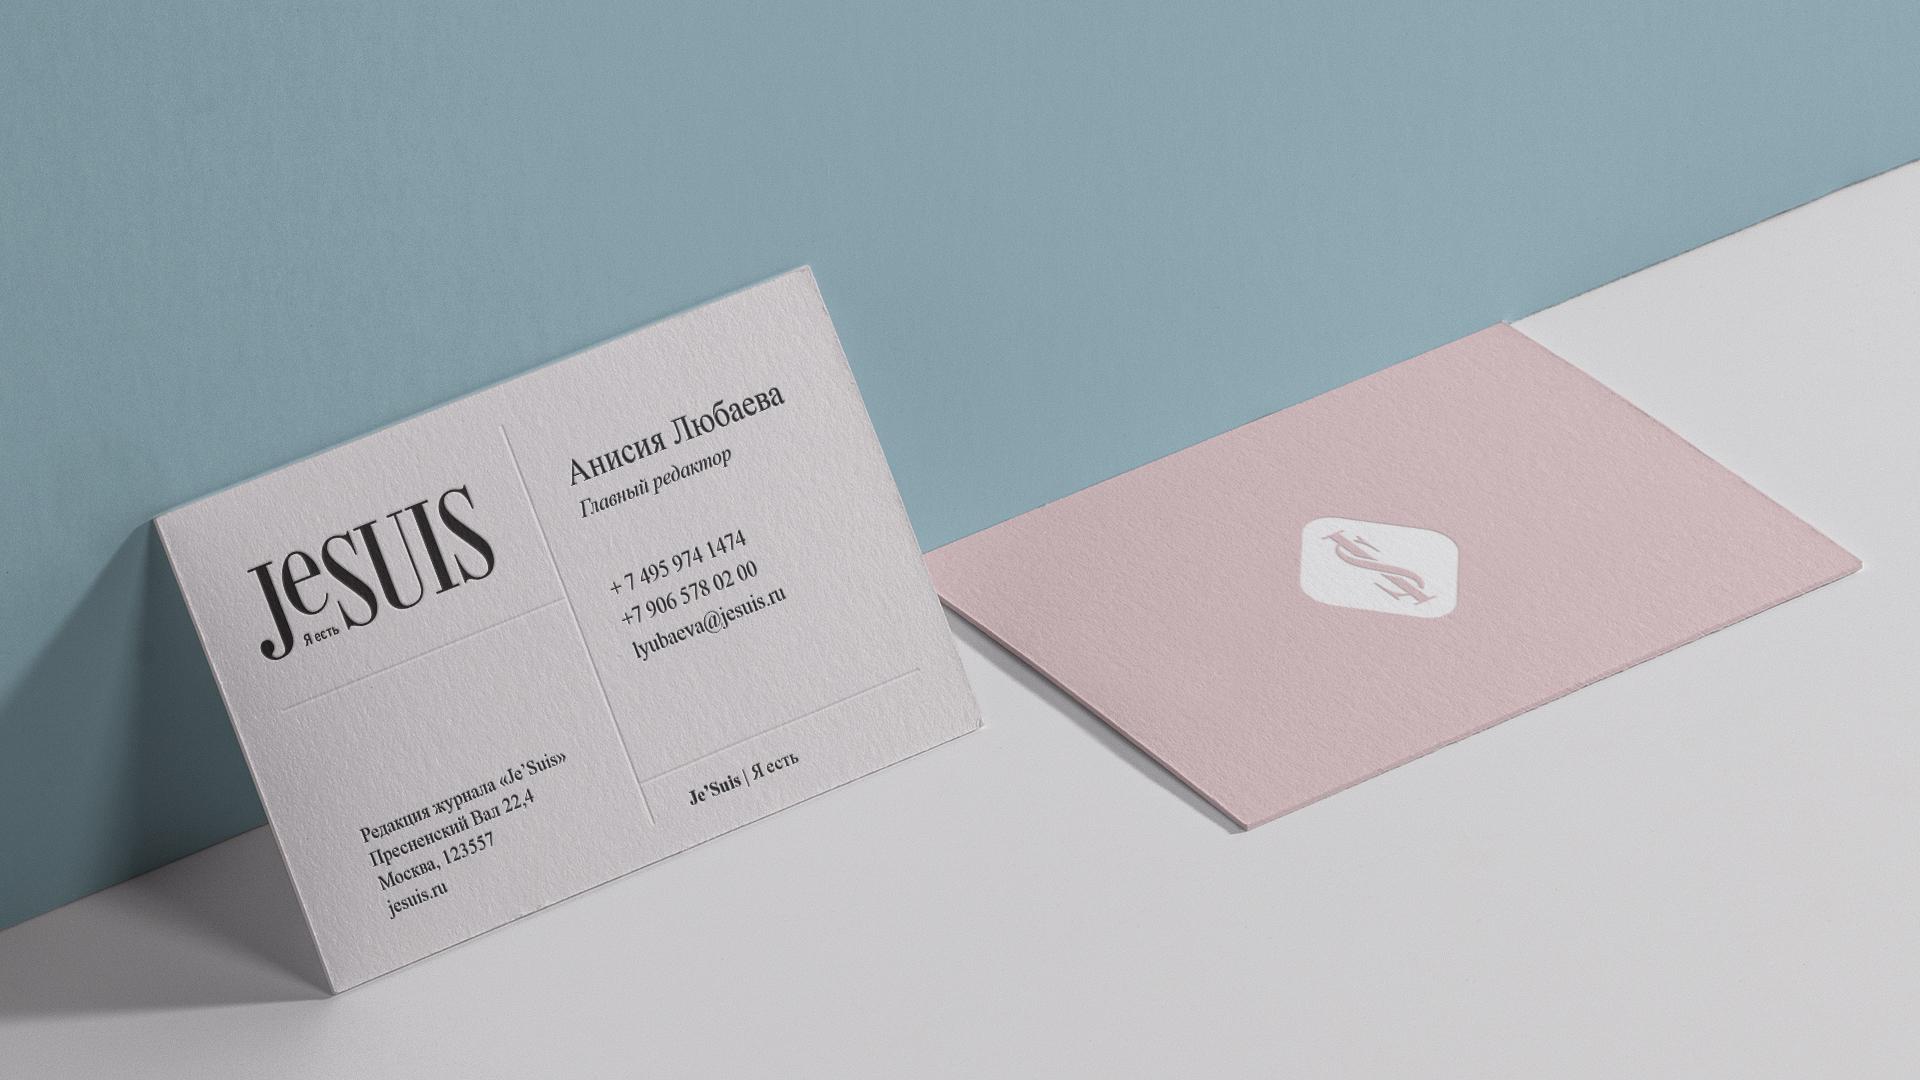 Je_SuisB_cards.jpg